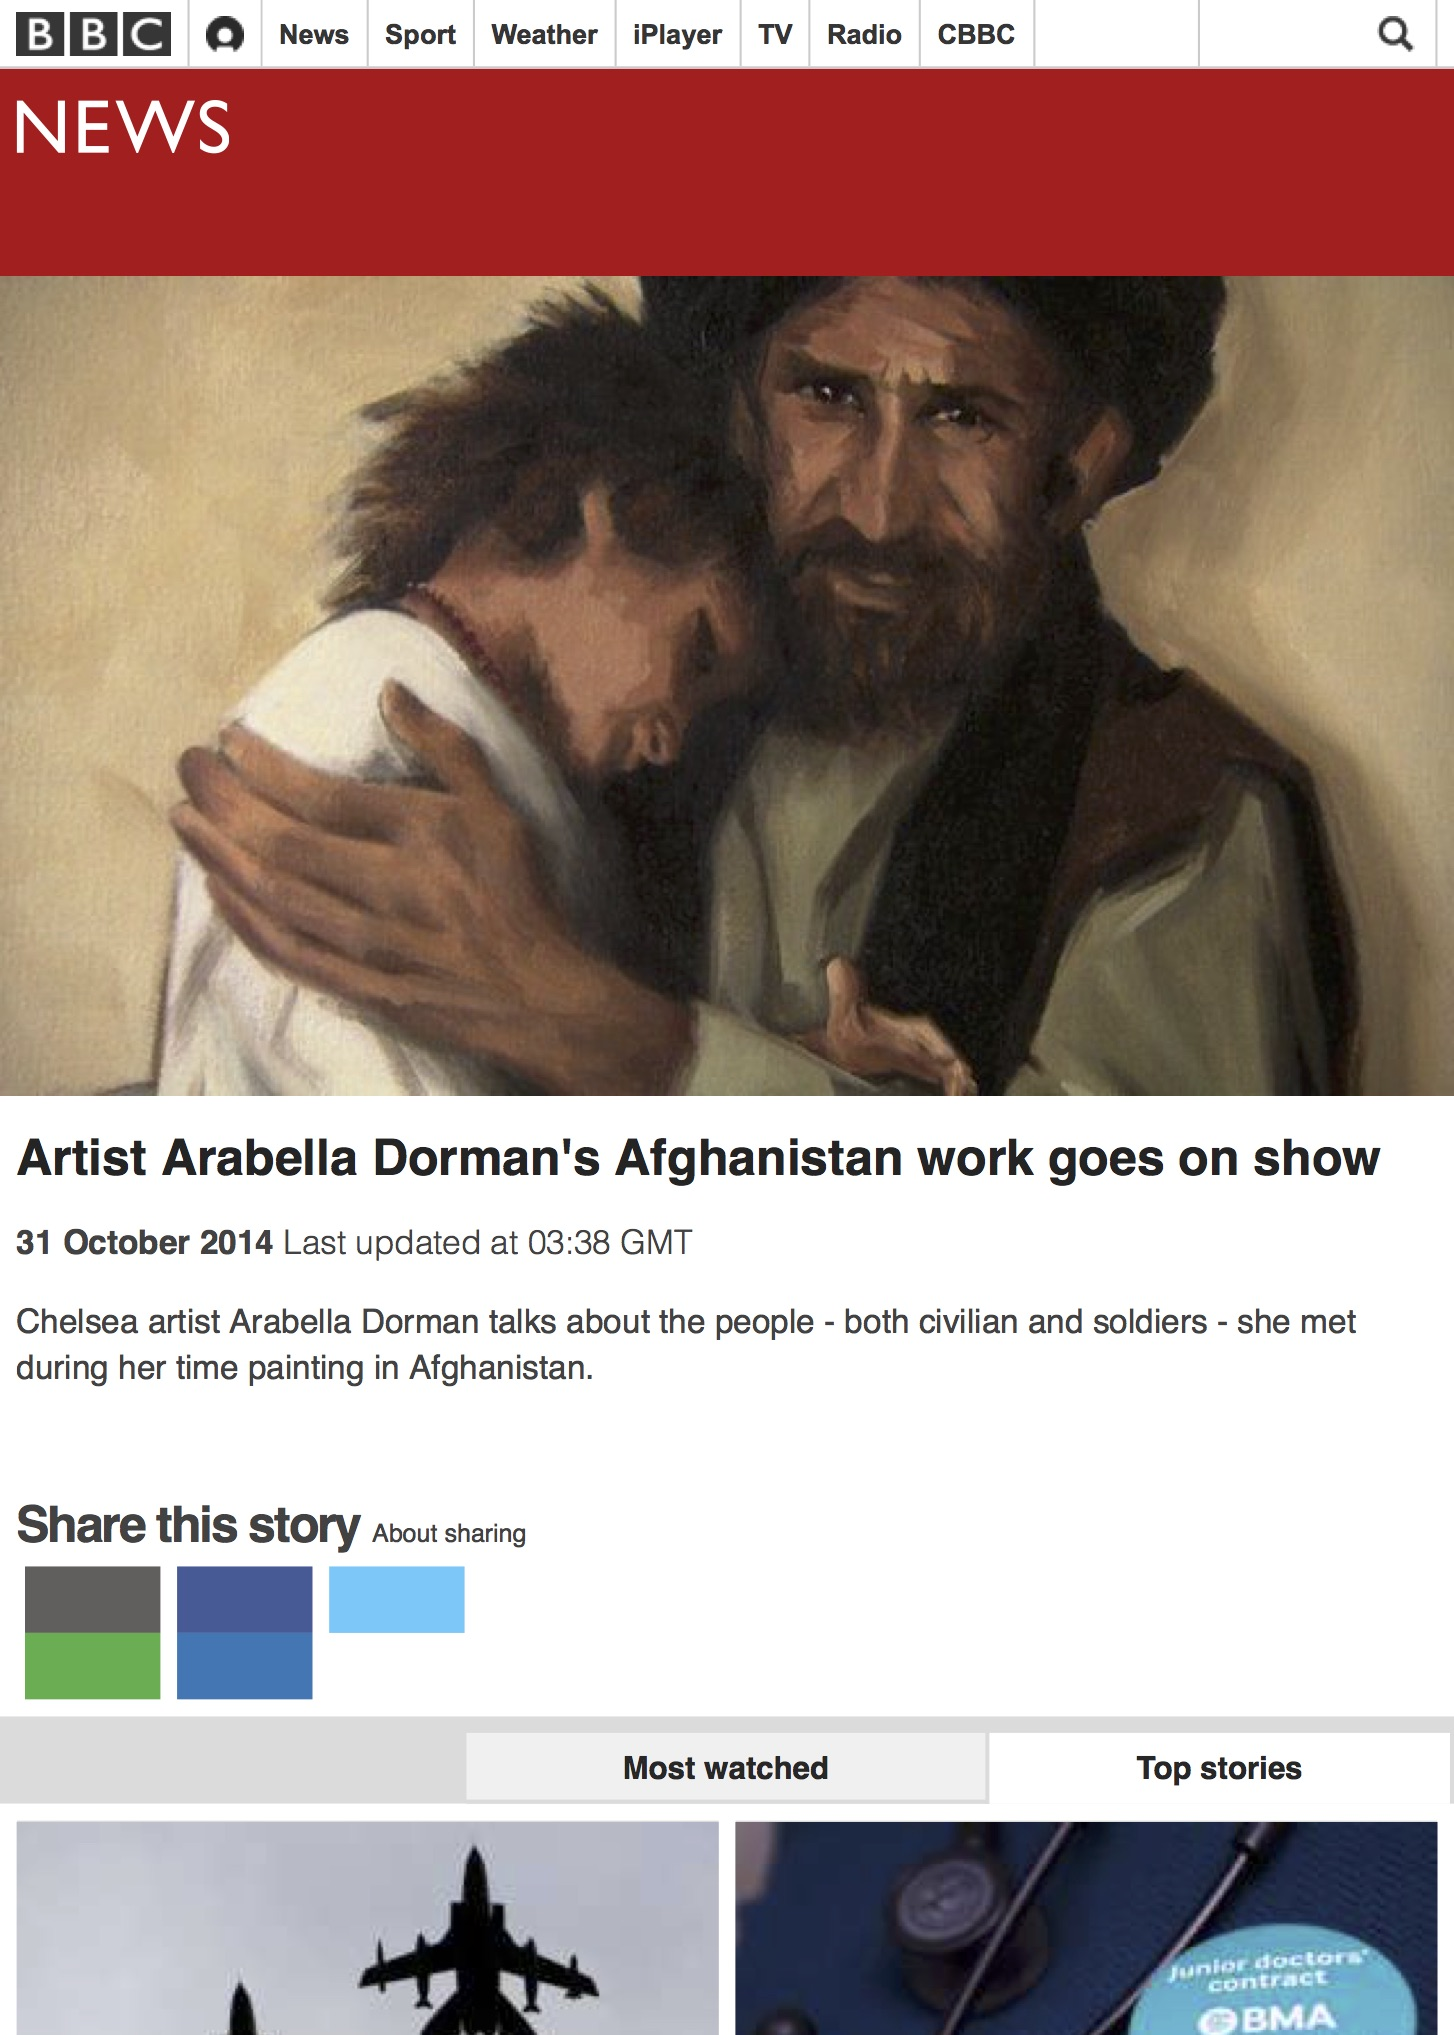 Artist Arabella Dorman's Afghanistan work goes on show - BBC News.jpg